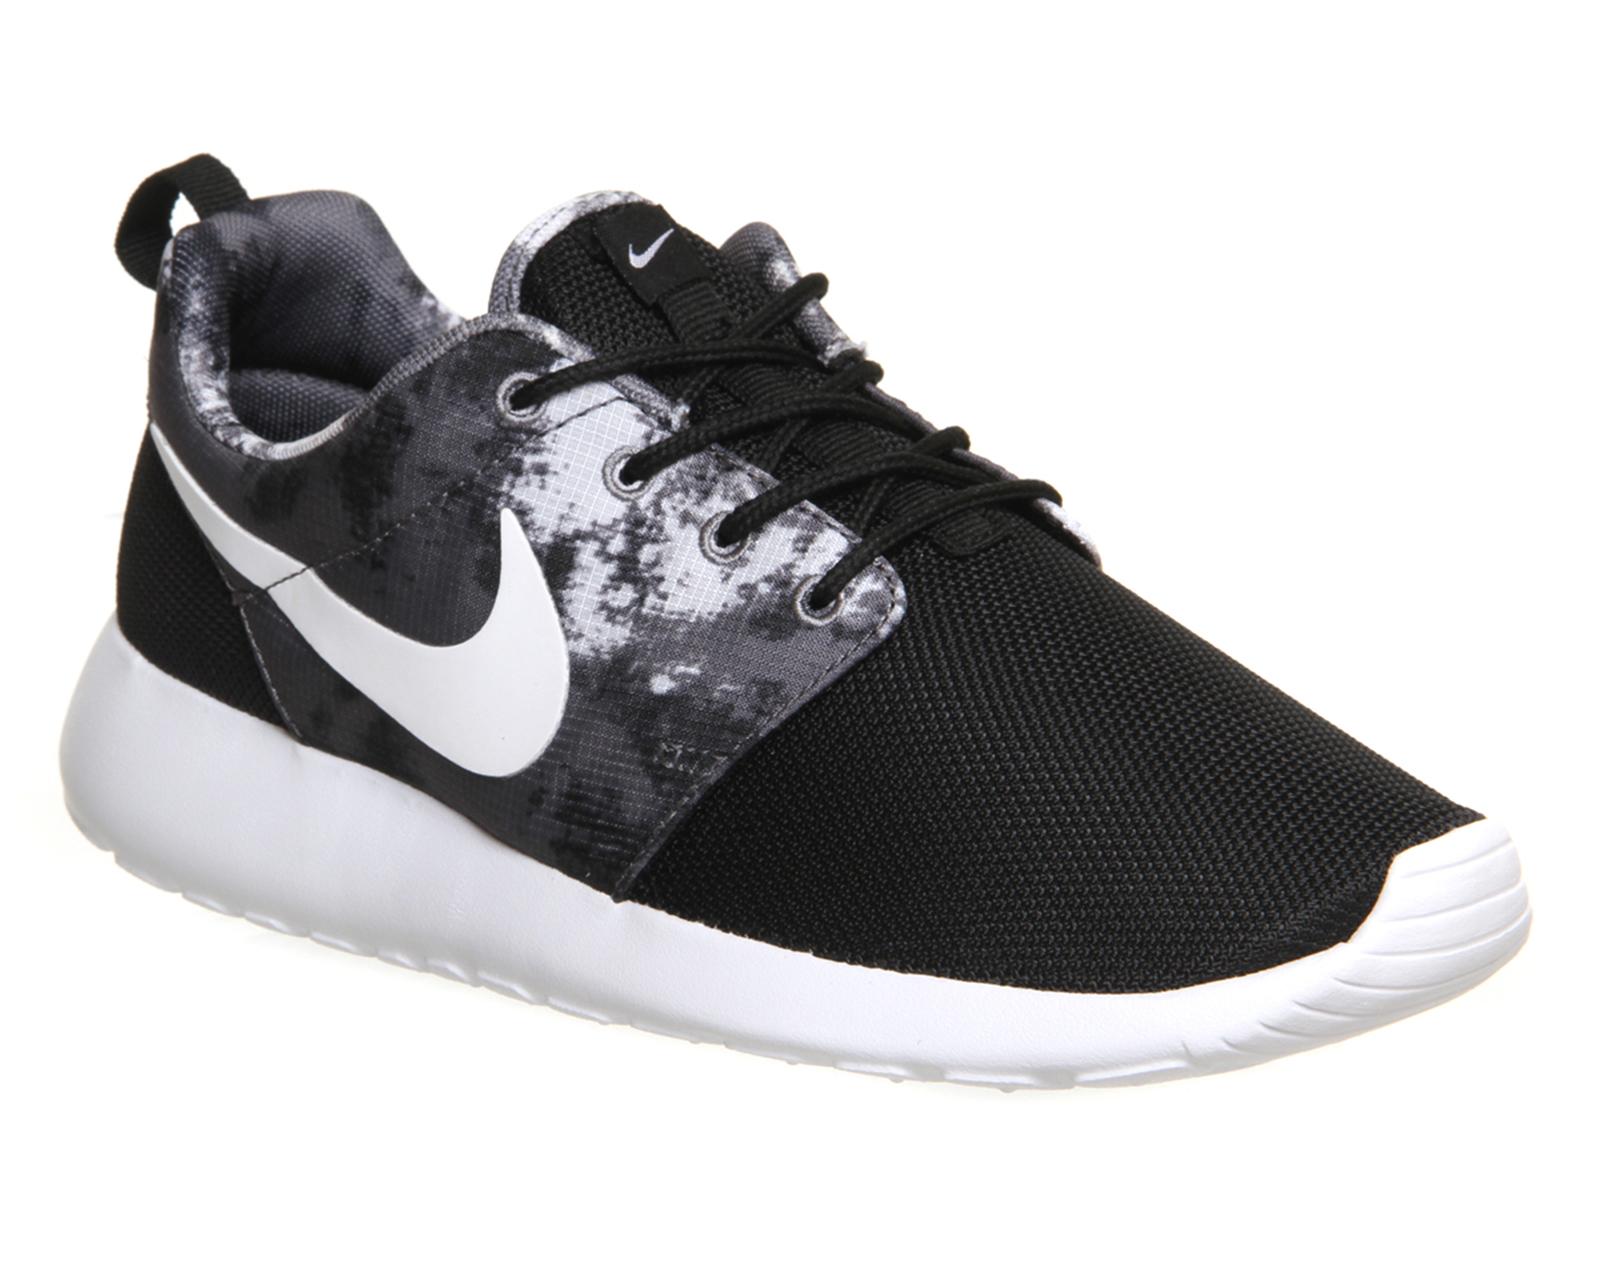 c4ec71ad87ce9 Nike Roshe Run Black White Cool Grey Print - Unisex Sports